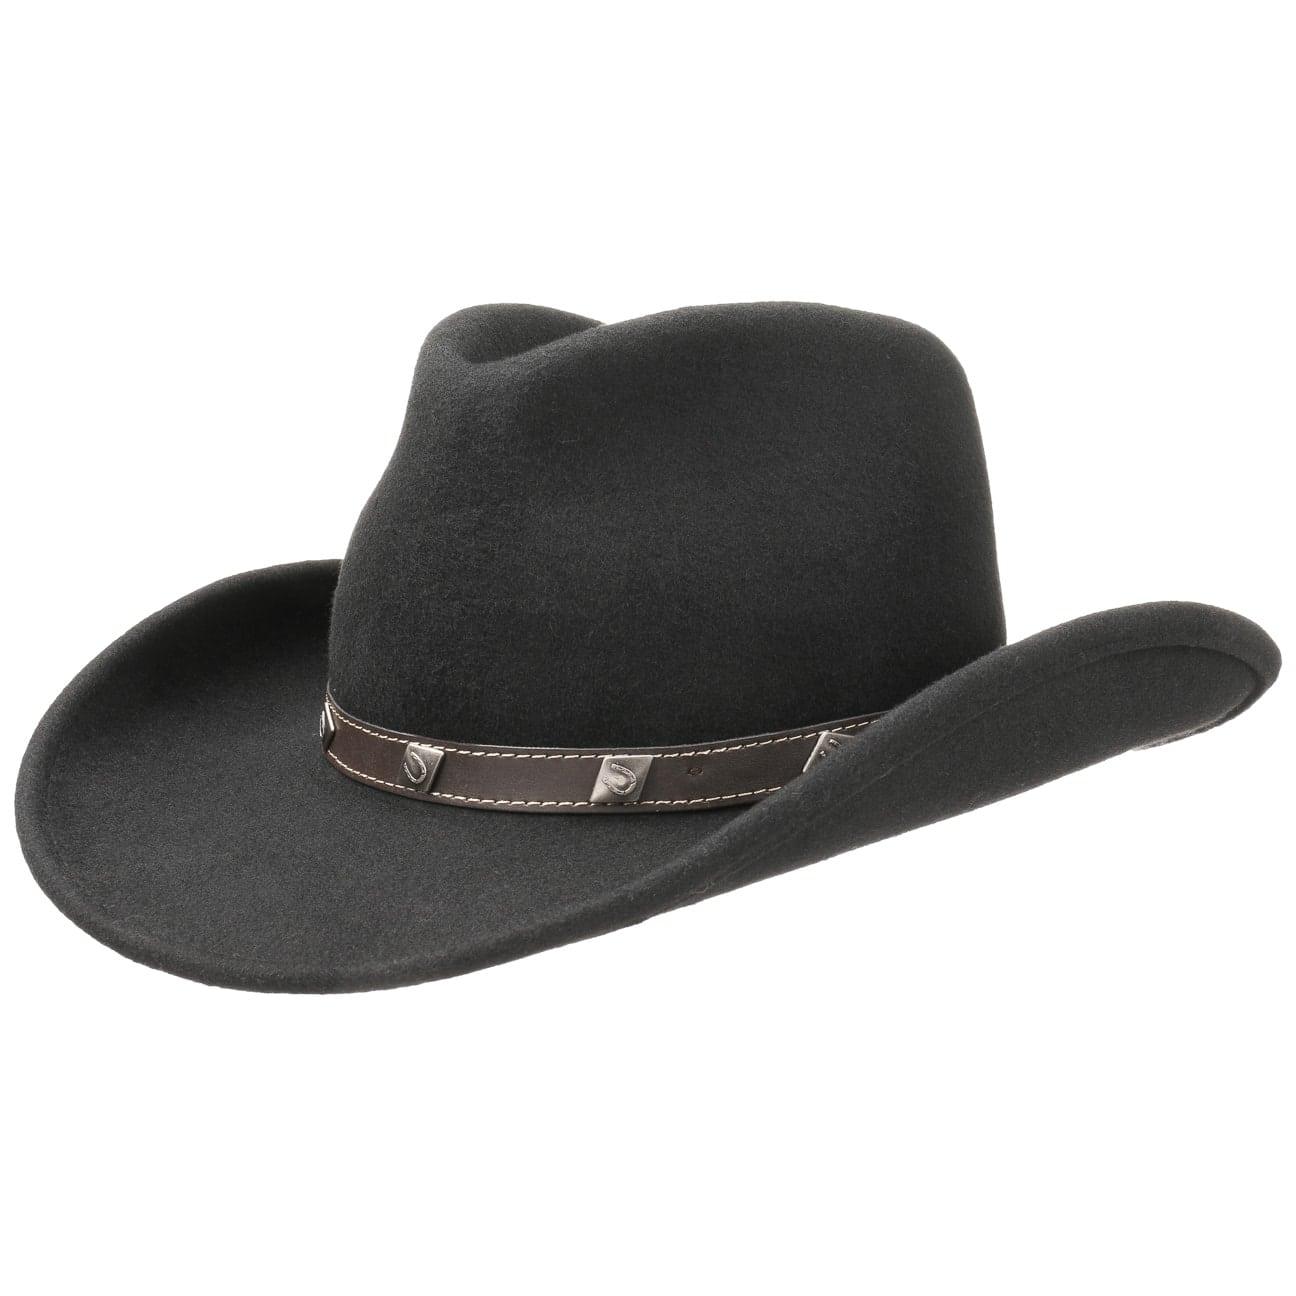 Sombrero Western Corralo by Conner  sombrero de fieltro de lana